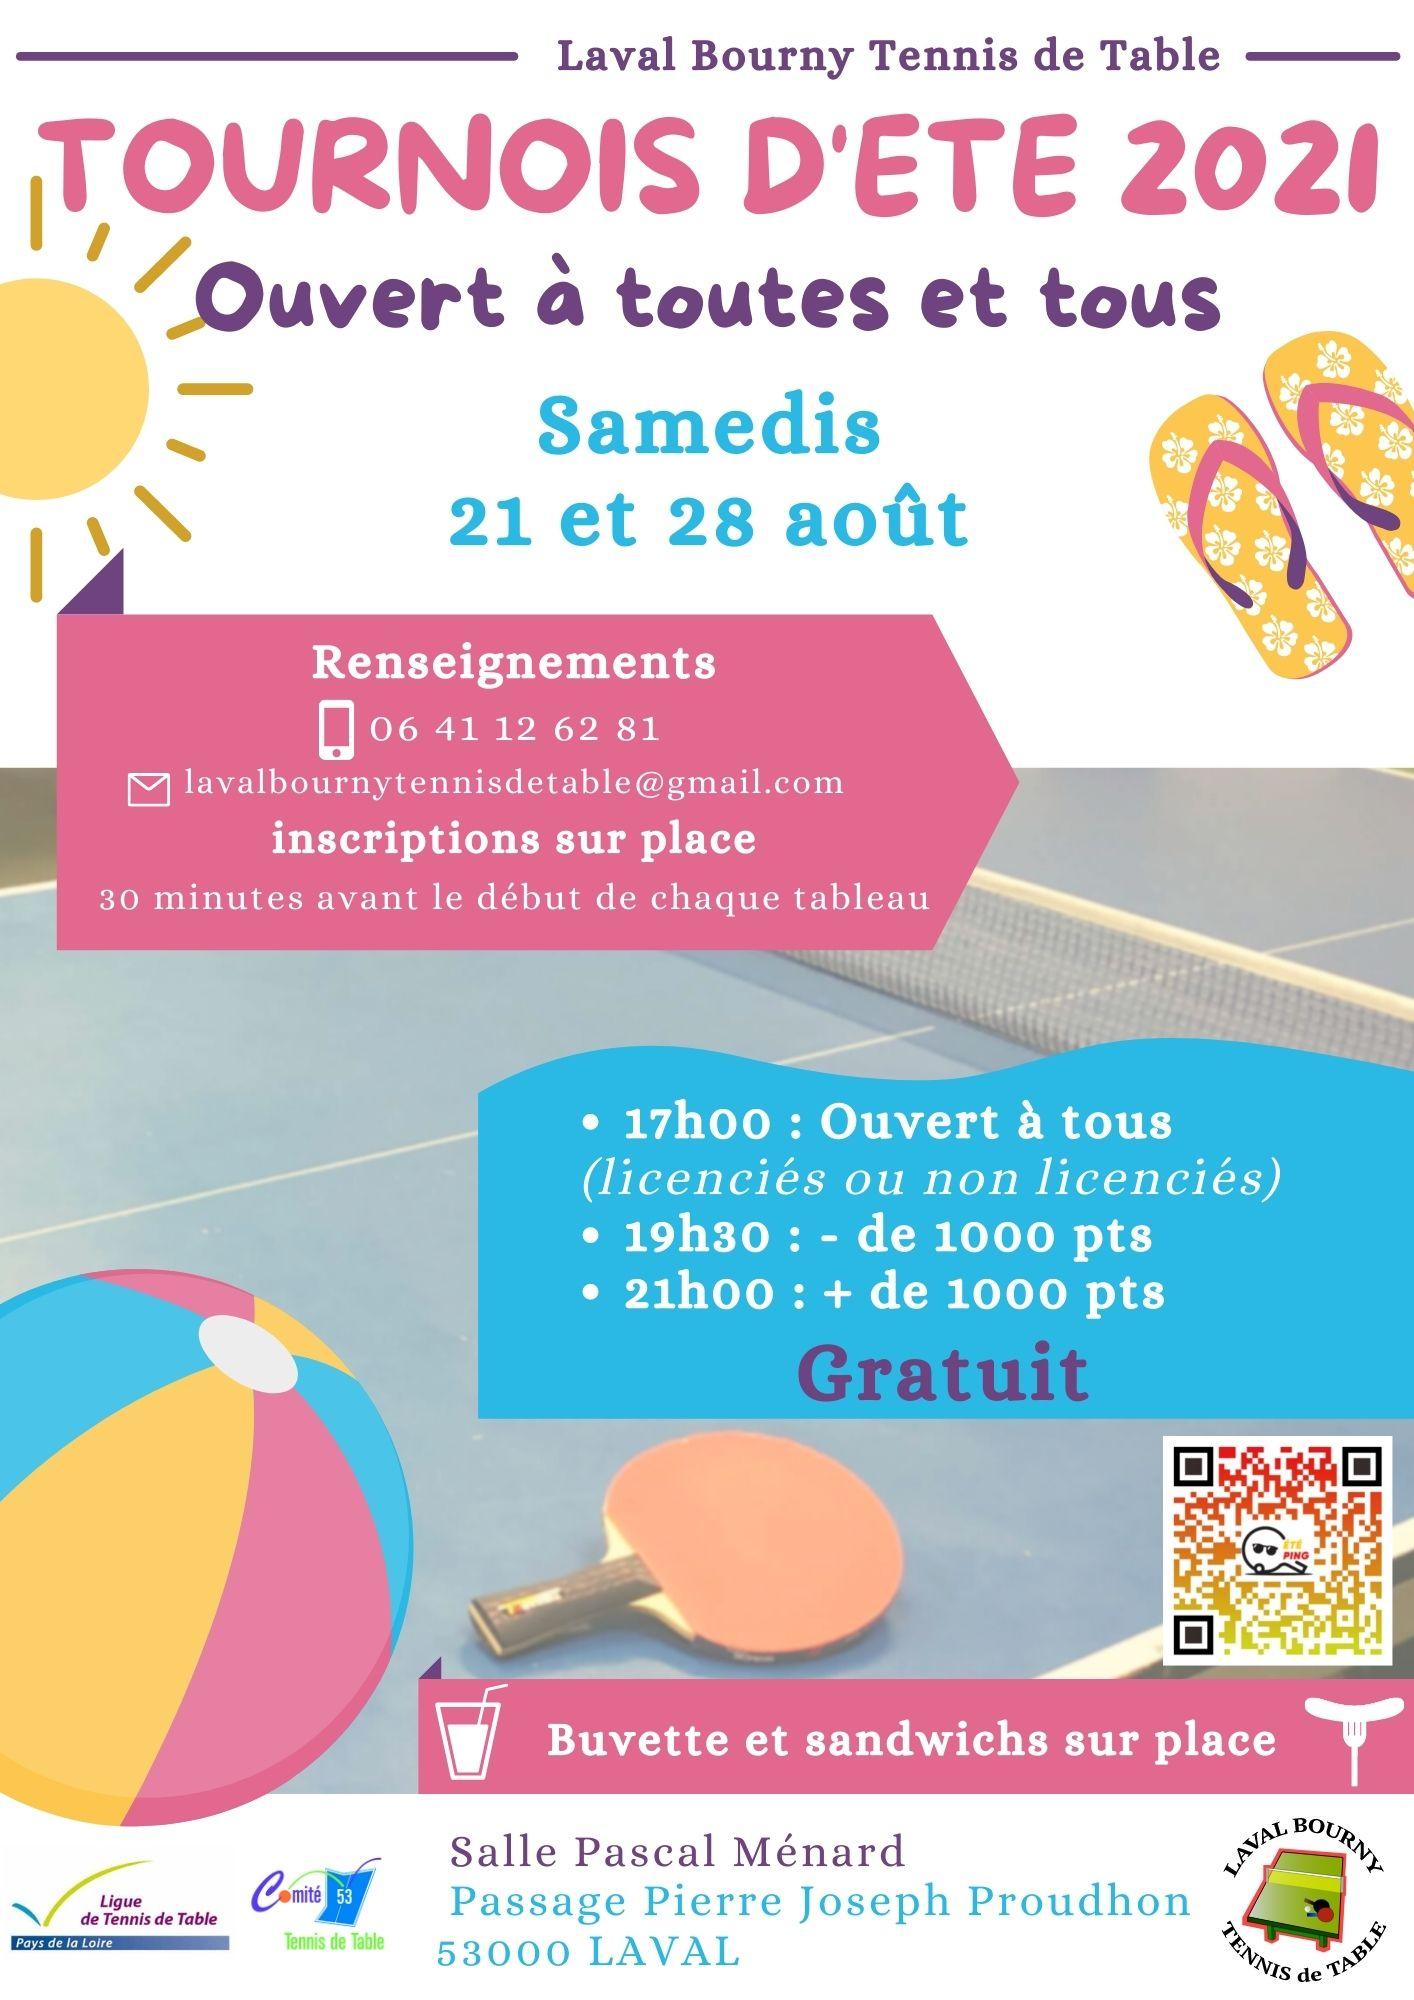 Affiche tournois Laval Bourny